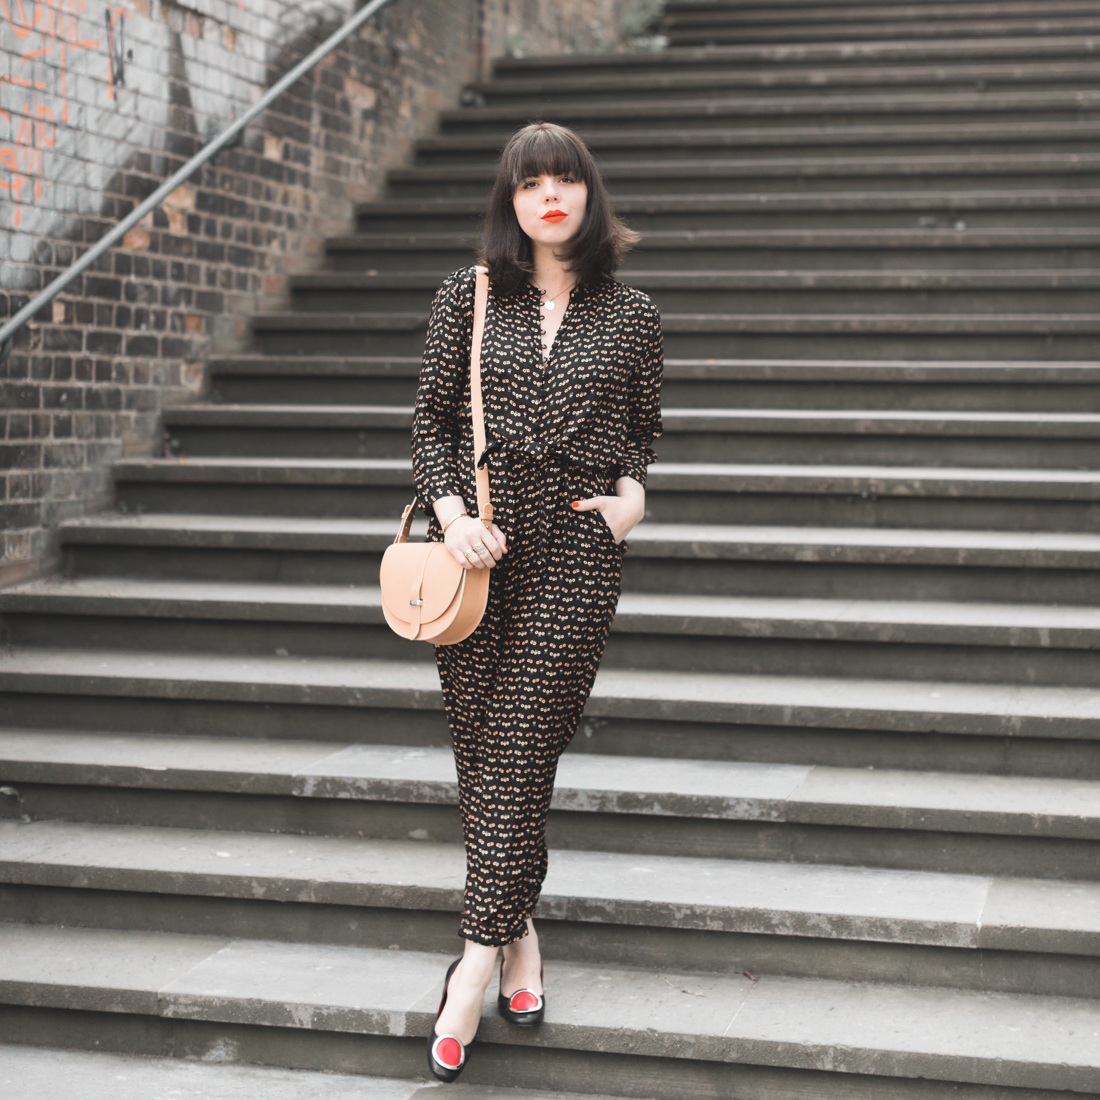 combi_sezane_sac_claude_ballerines-chaussures-exclusif-paris_Pauline_Privez_paulinefashionblog_com-6